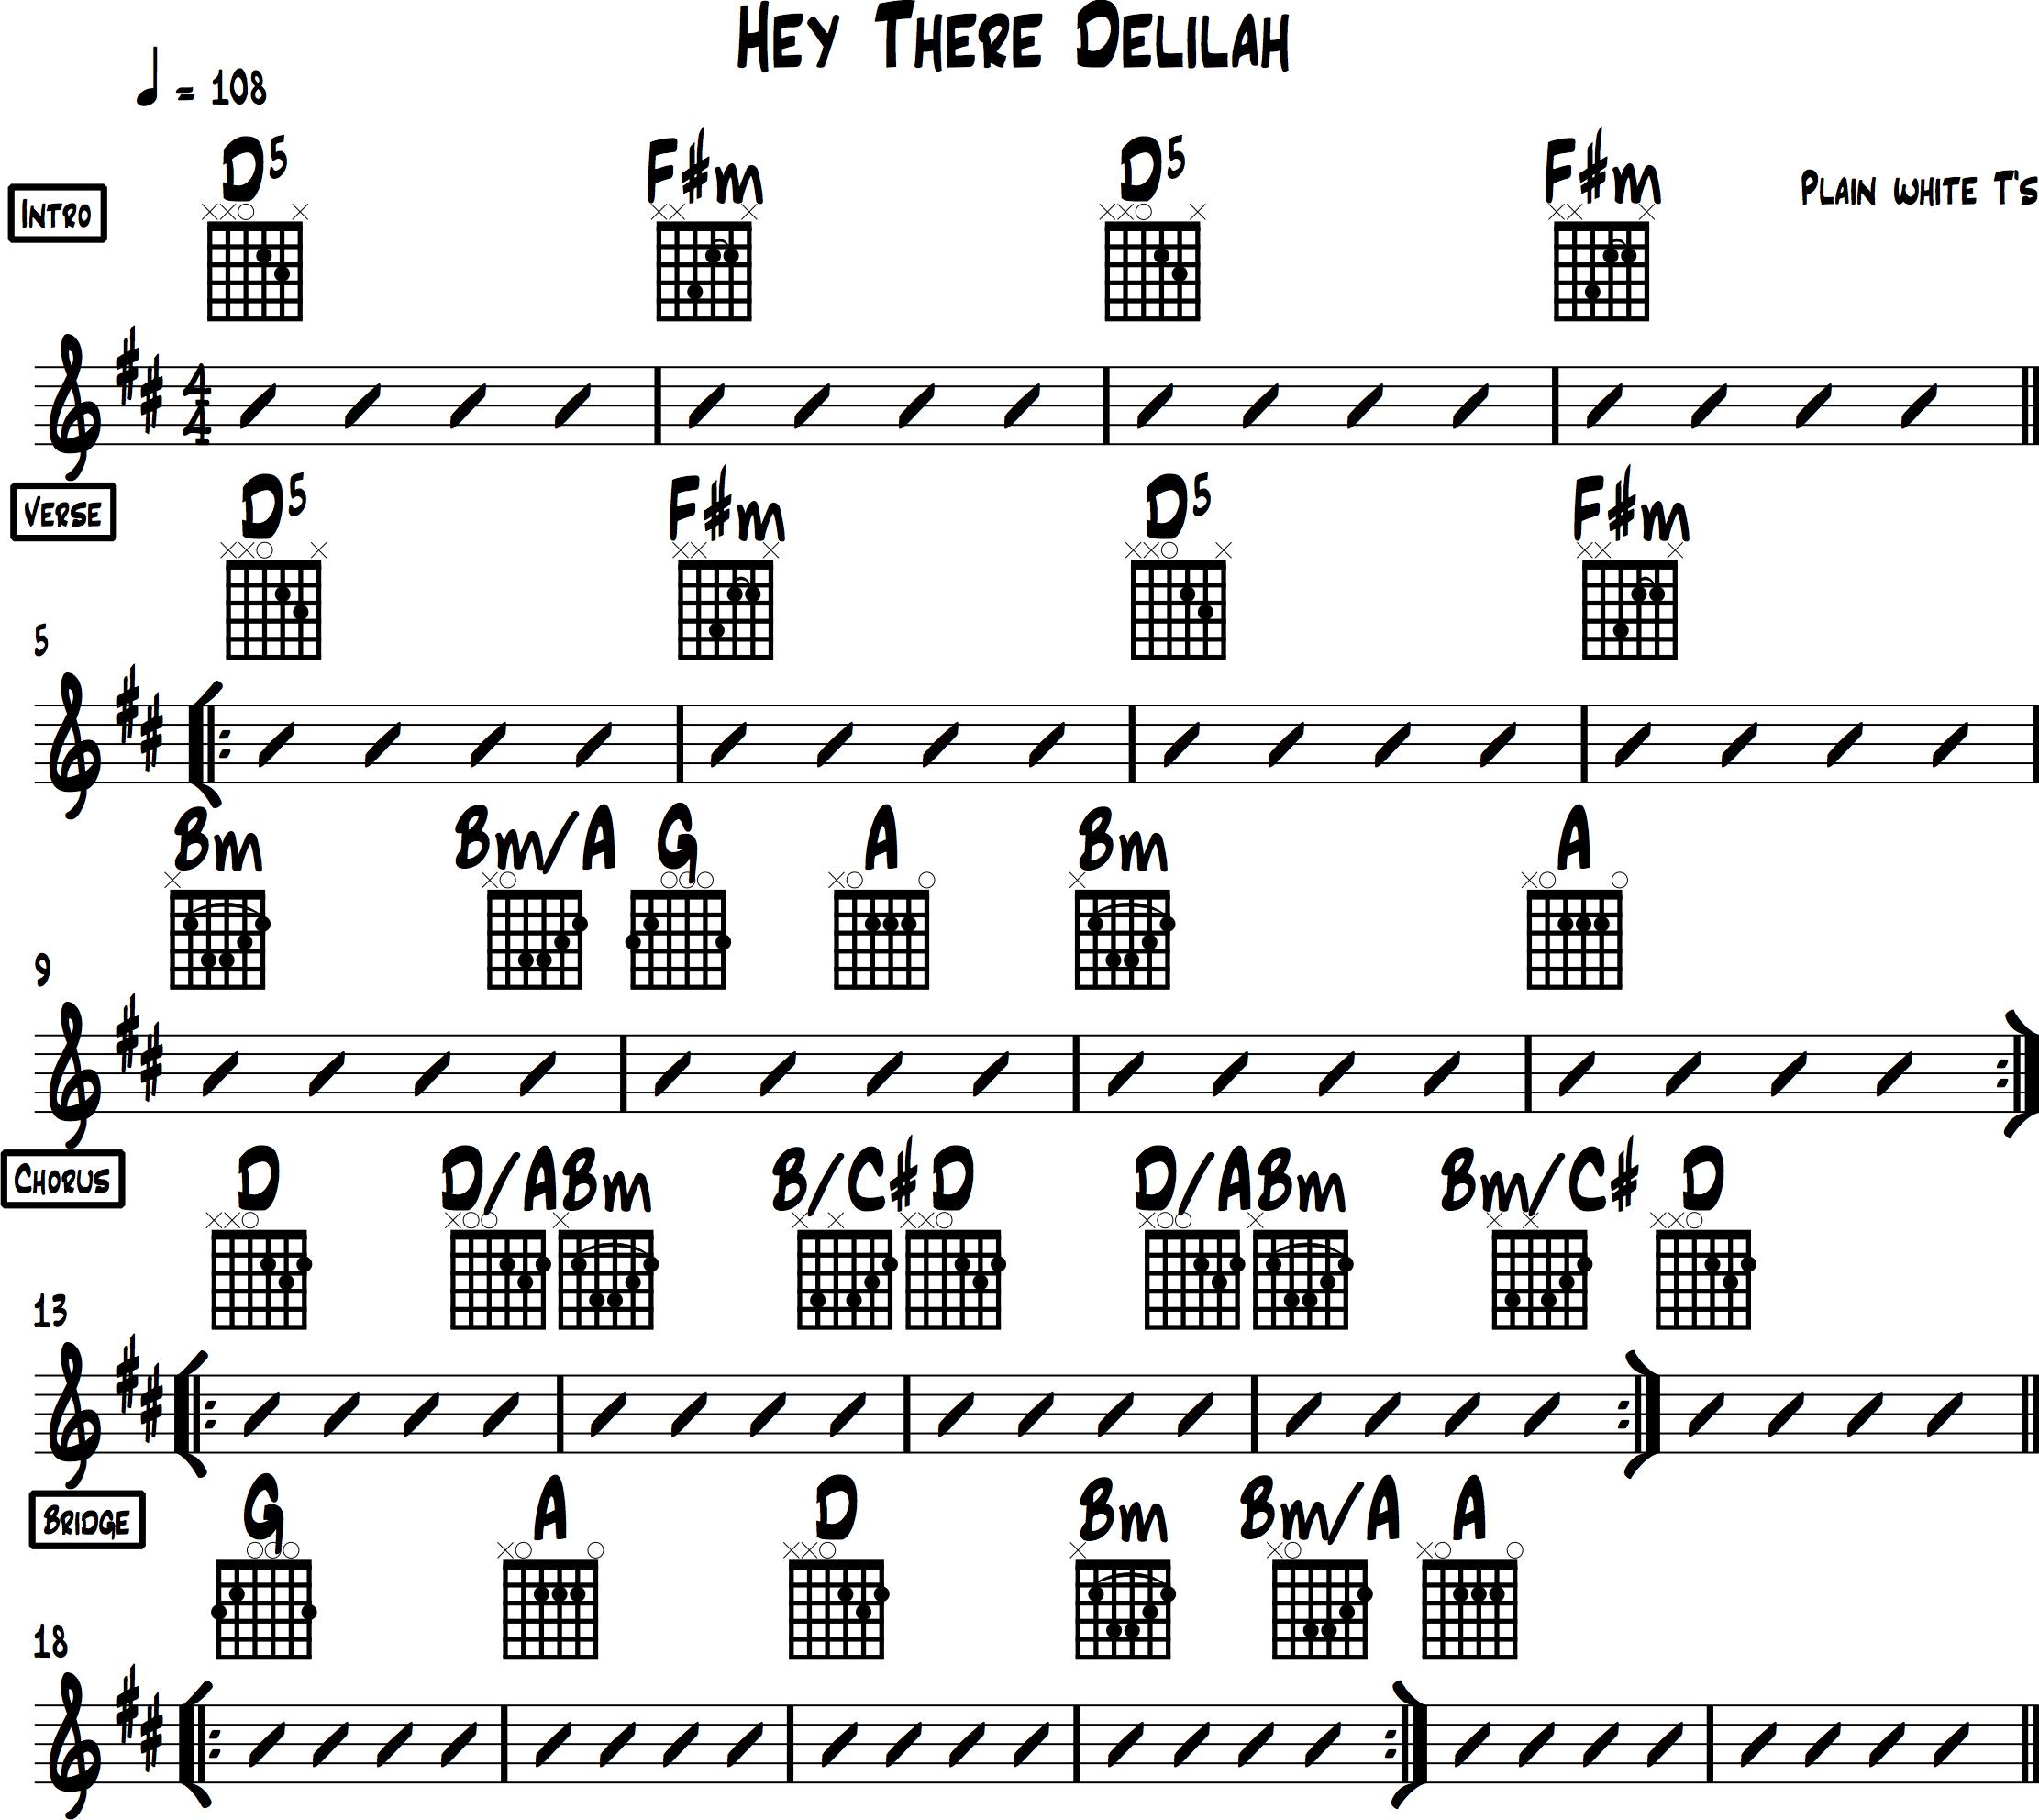 Hey There Delilah guitar arrangement